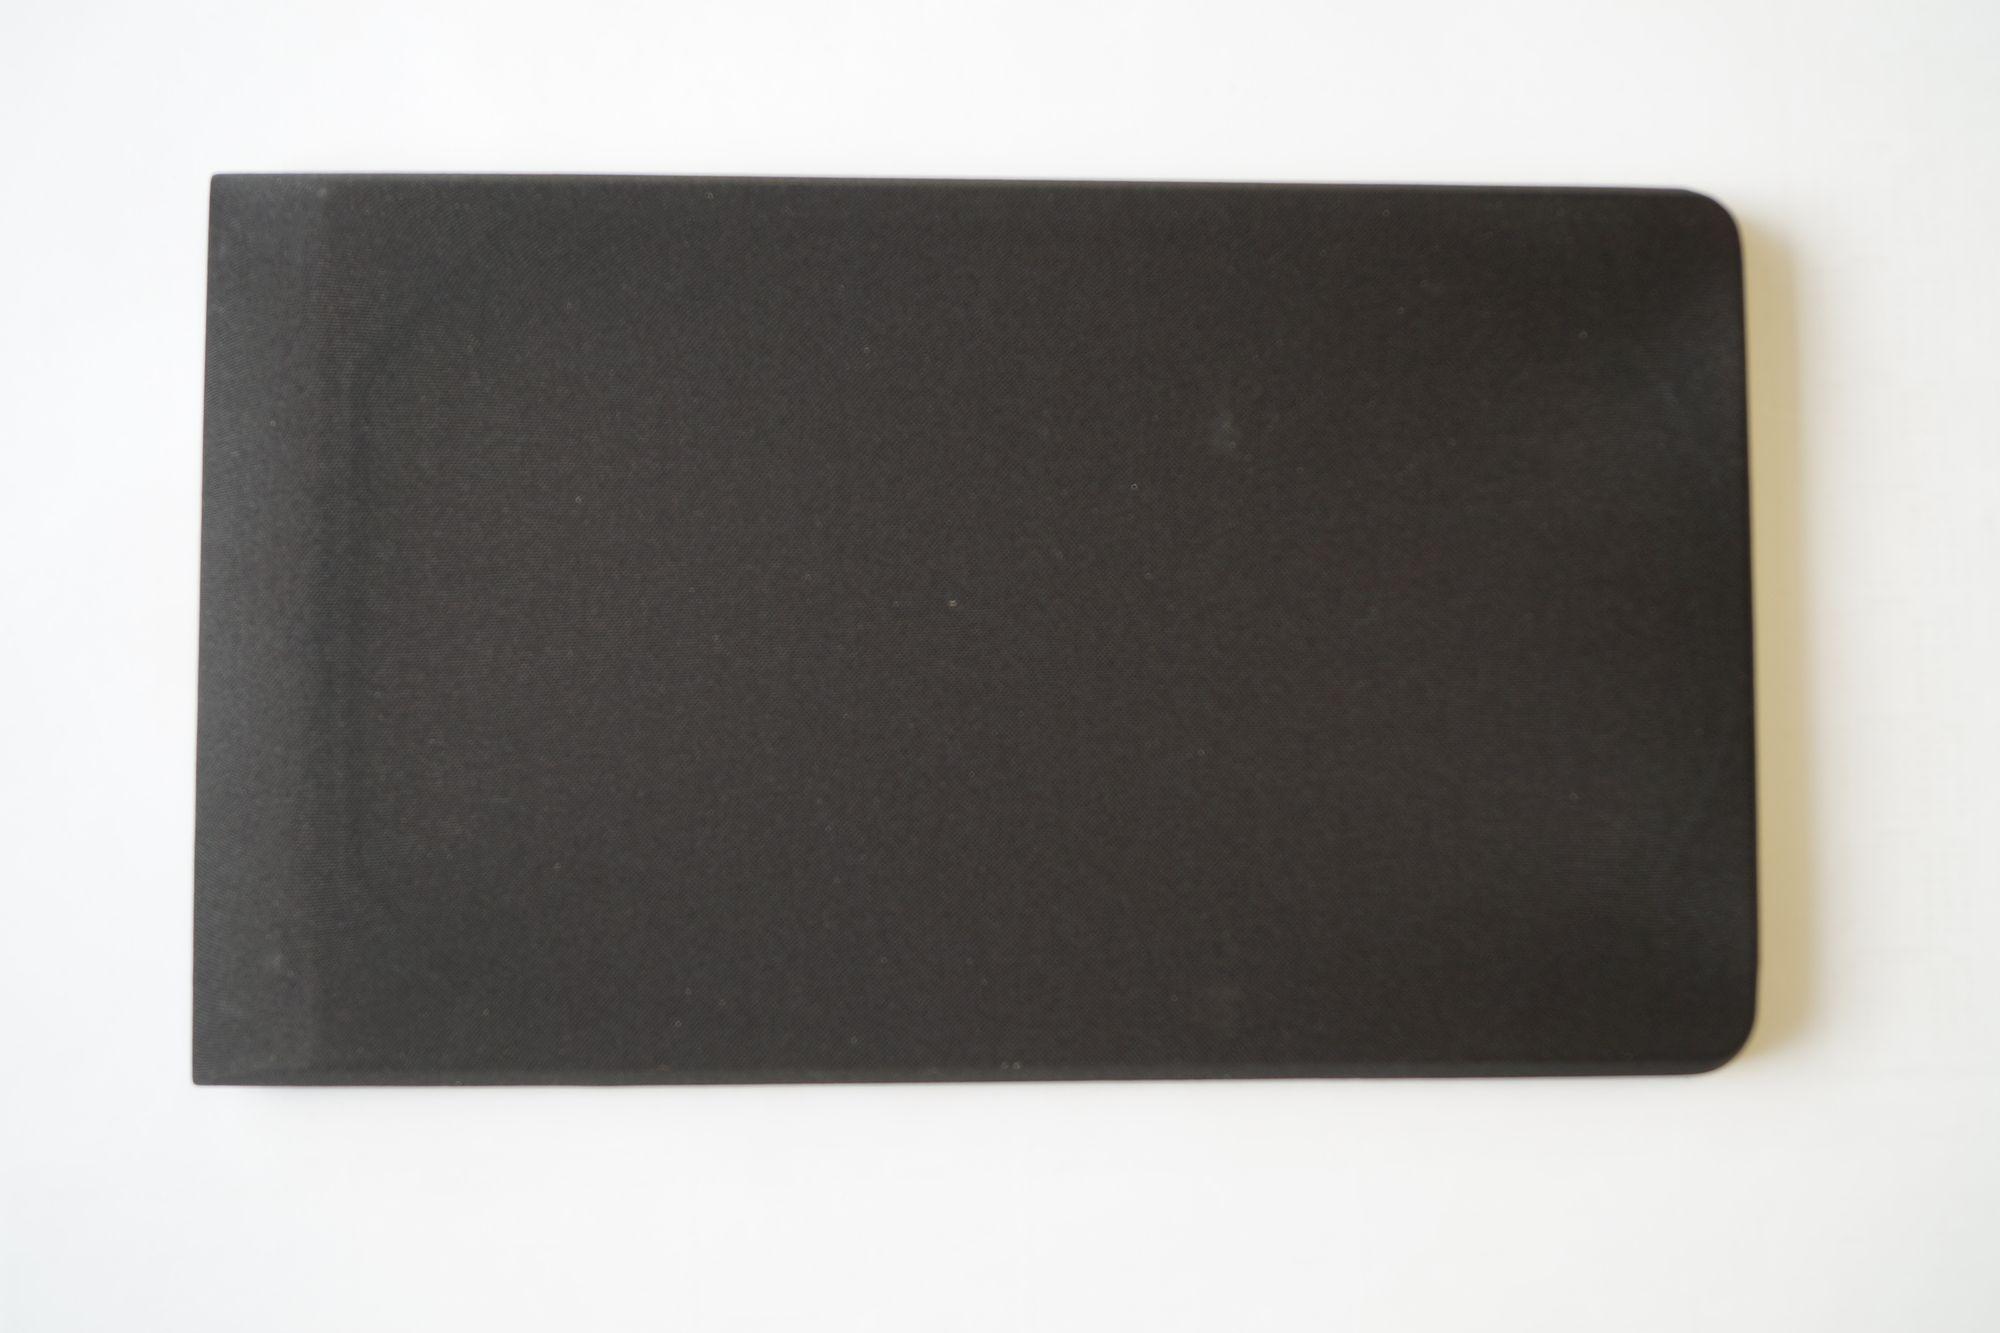 1 Stück Magnat Quantum 903 Lautsprecherabdeckung schwarz Neu